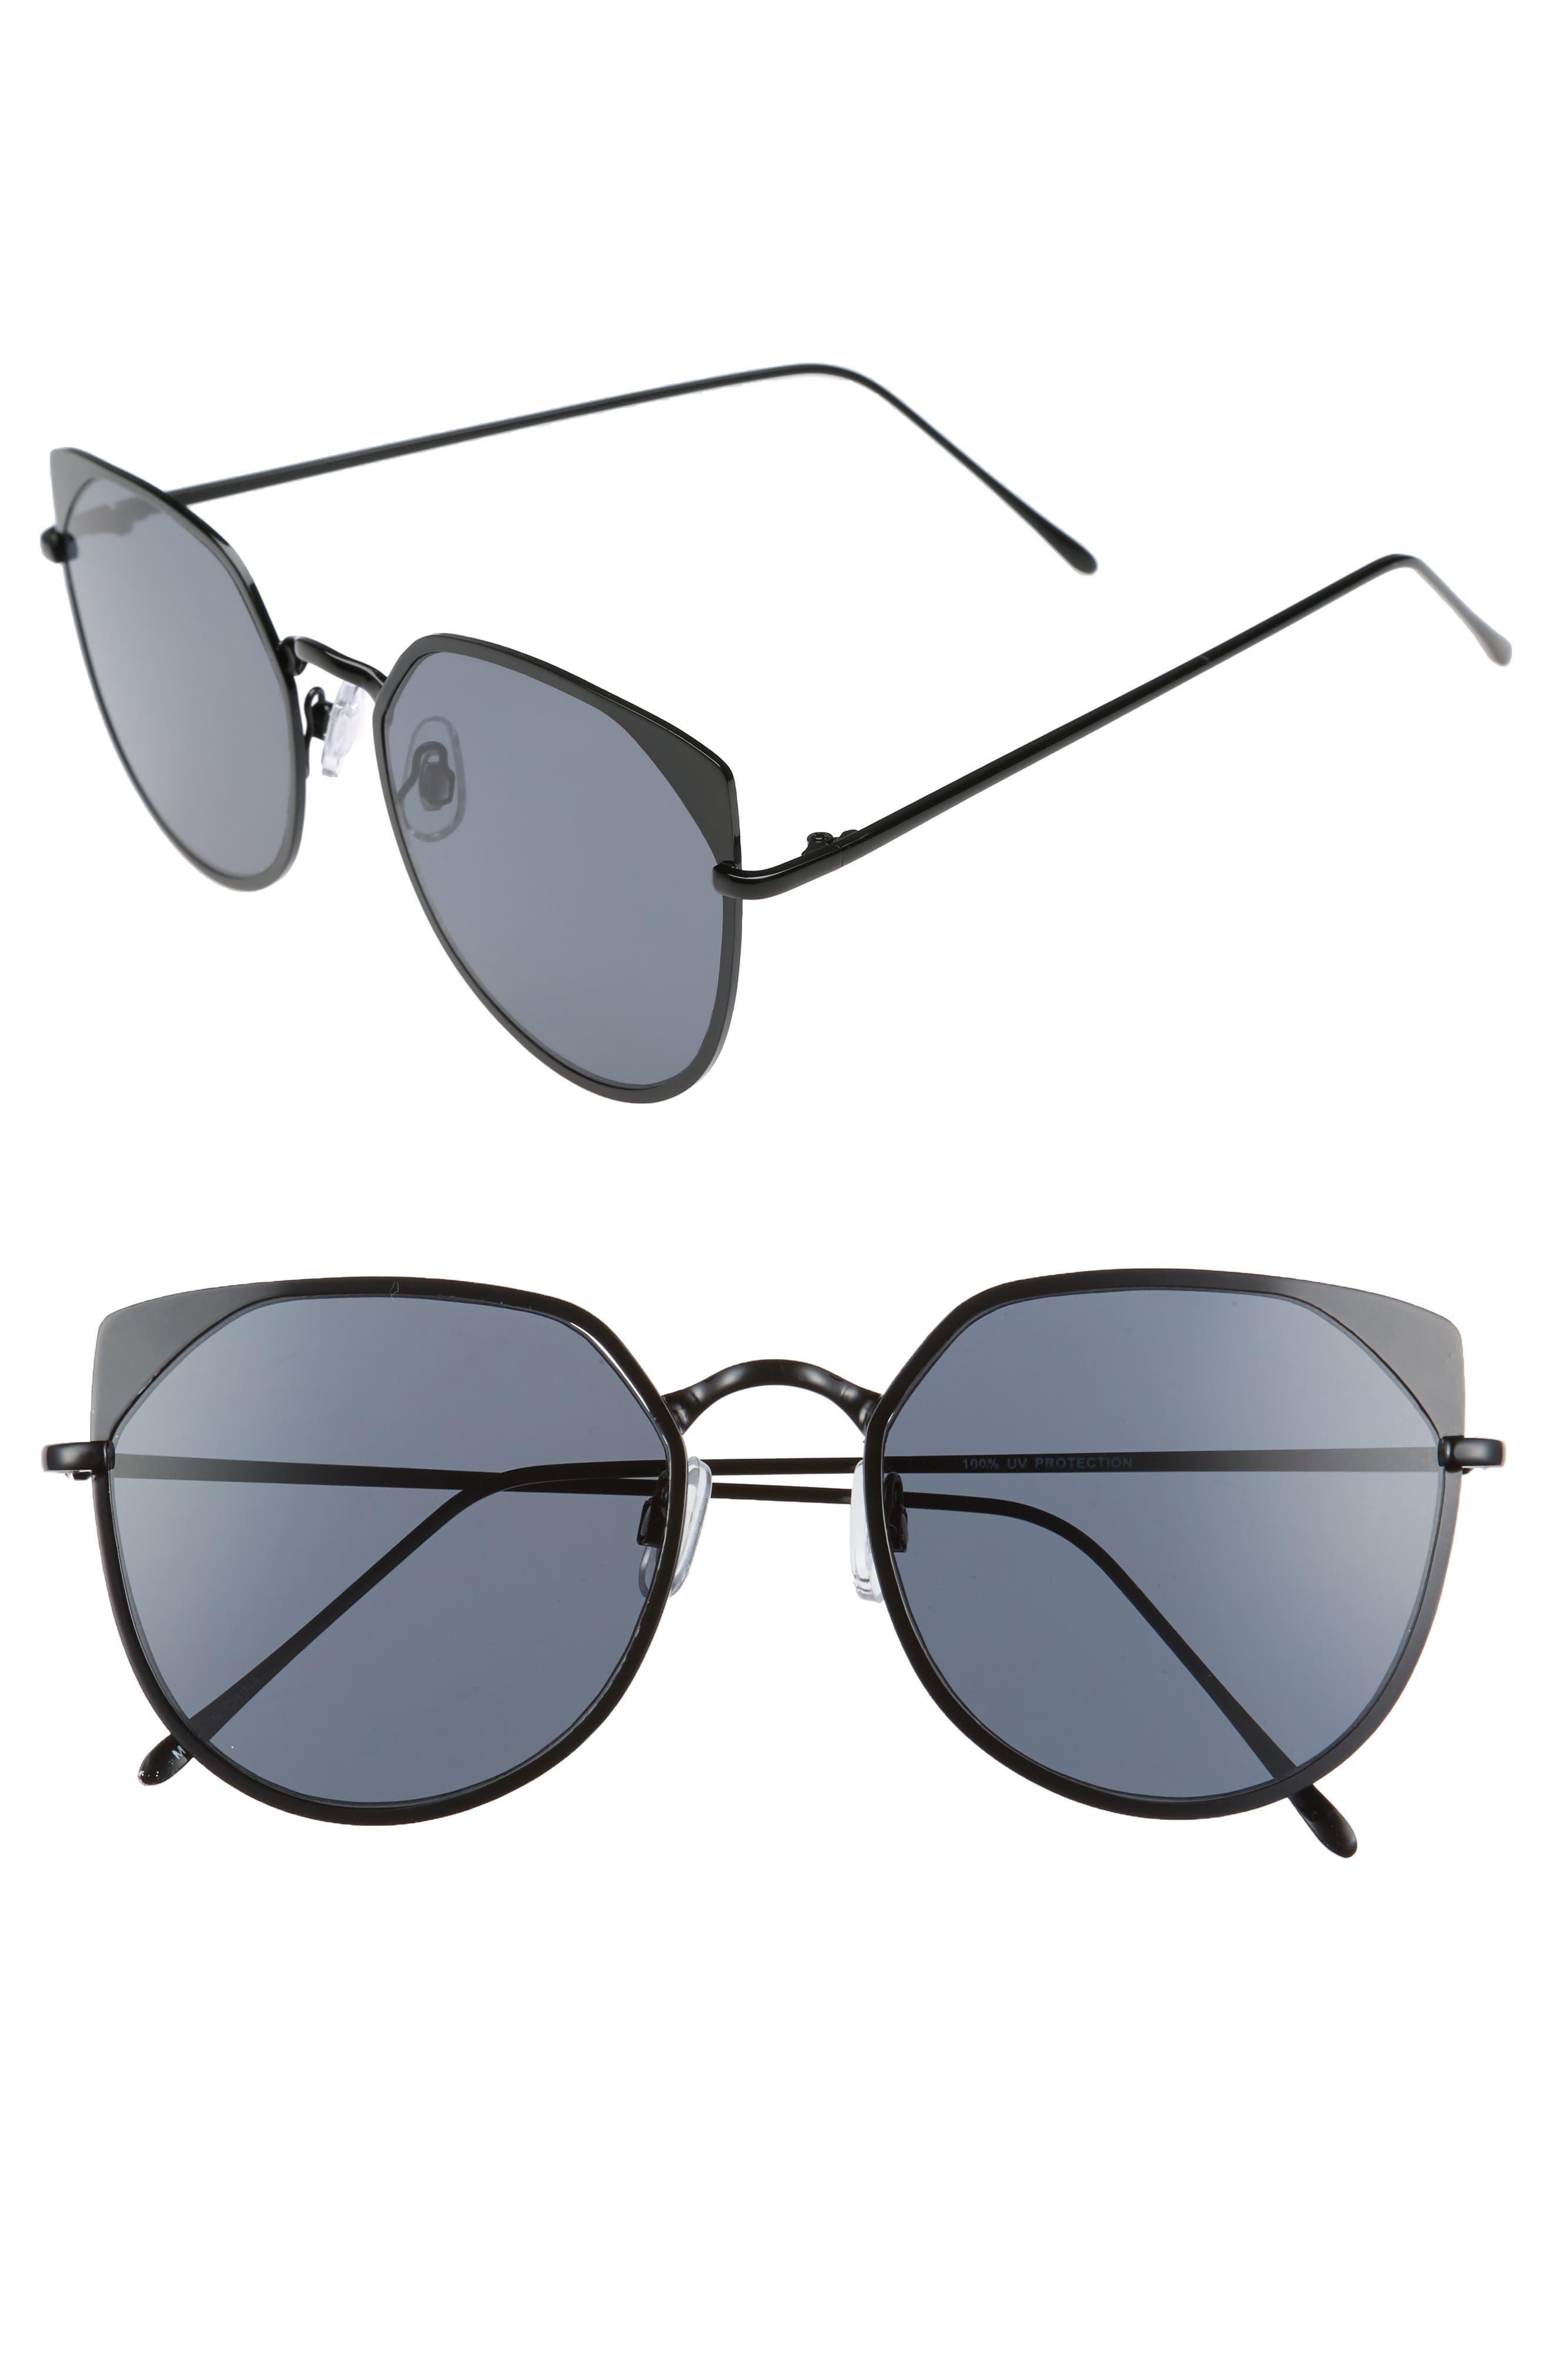 Alternate Image 1 Selected - BP. 55mm Mirrored Cat Eye Sunglasses